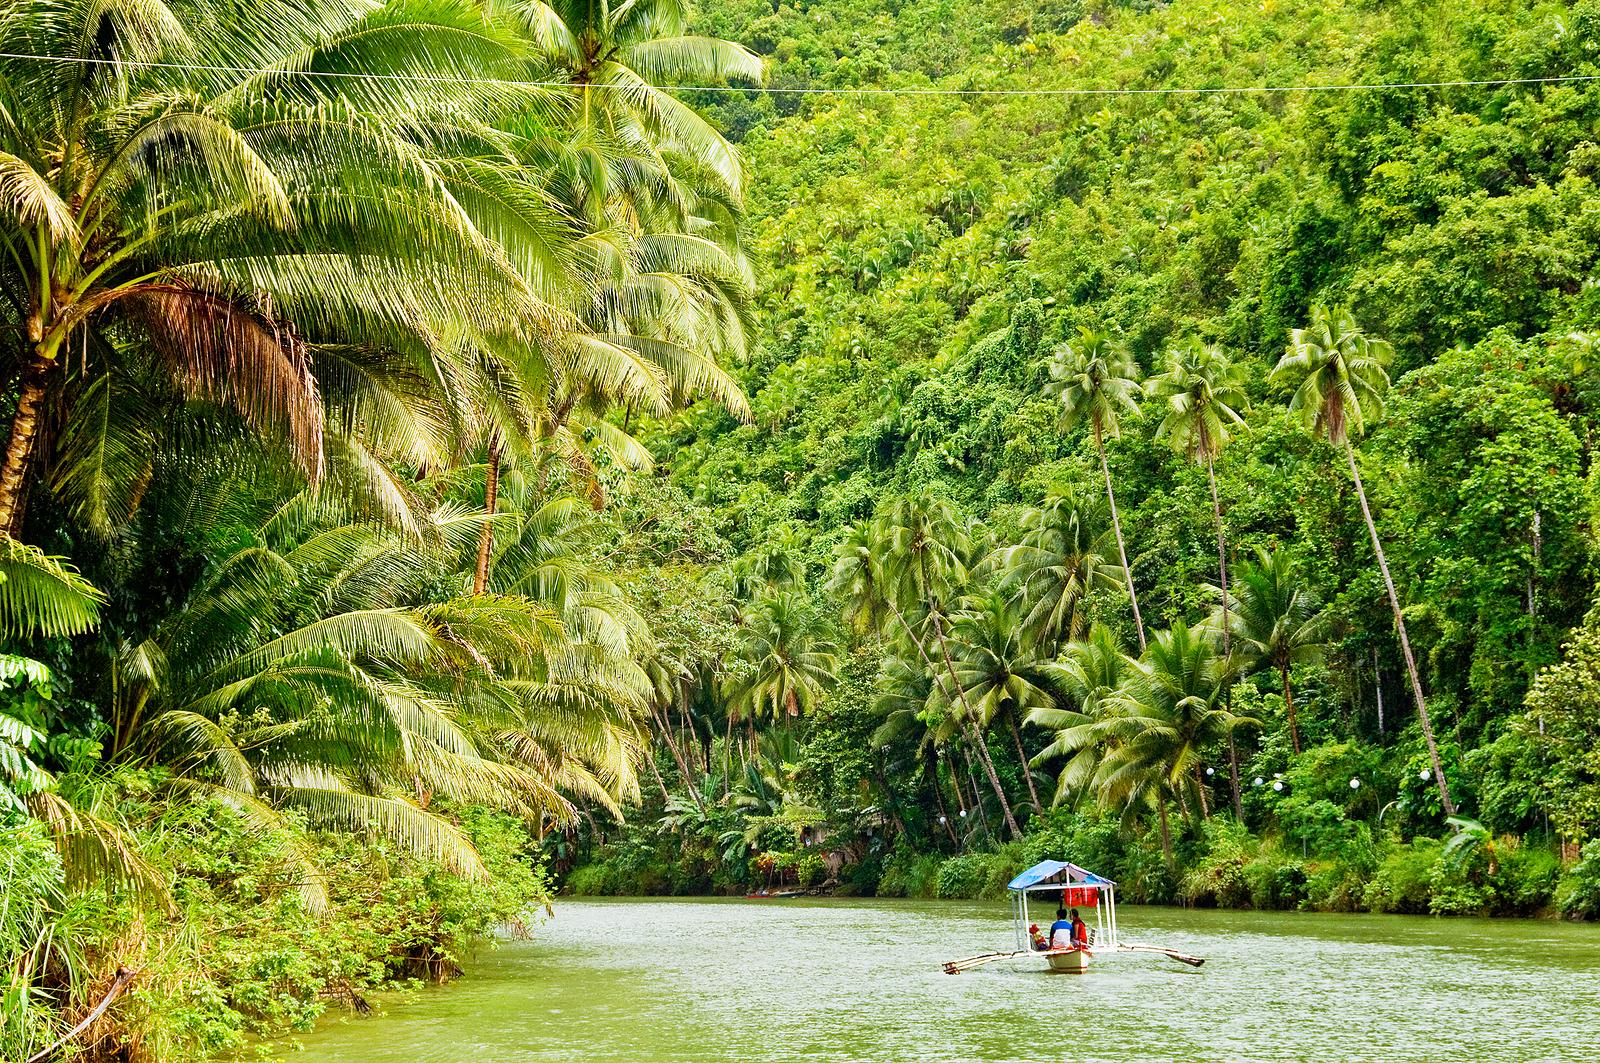 bigstock-Cruising-boat-on-Rainforest-Ri-25889867